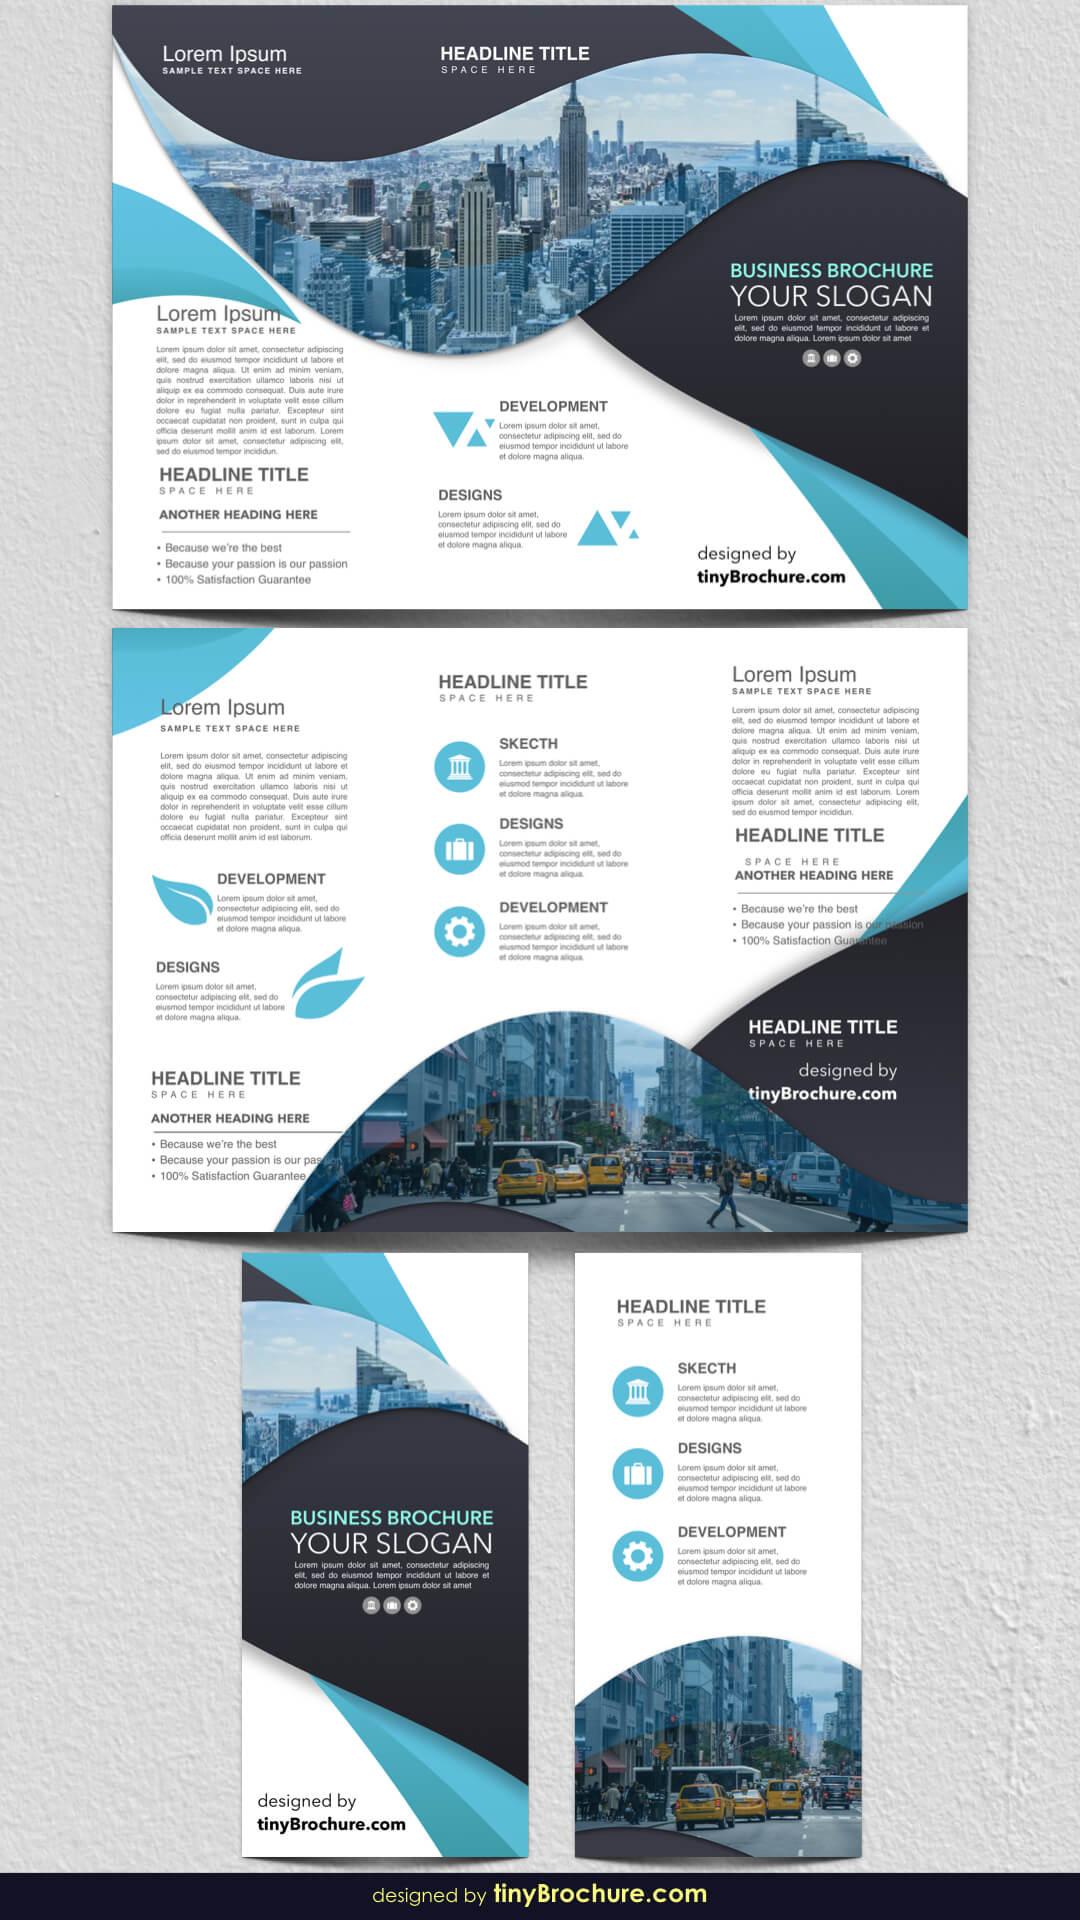 Brochure Template Google Docs | Graphic Design Brochure Within Google Docs Tri Fold Brochure Template